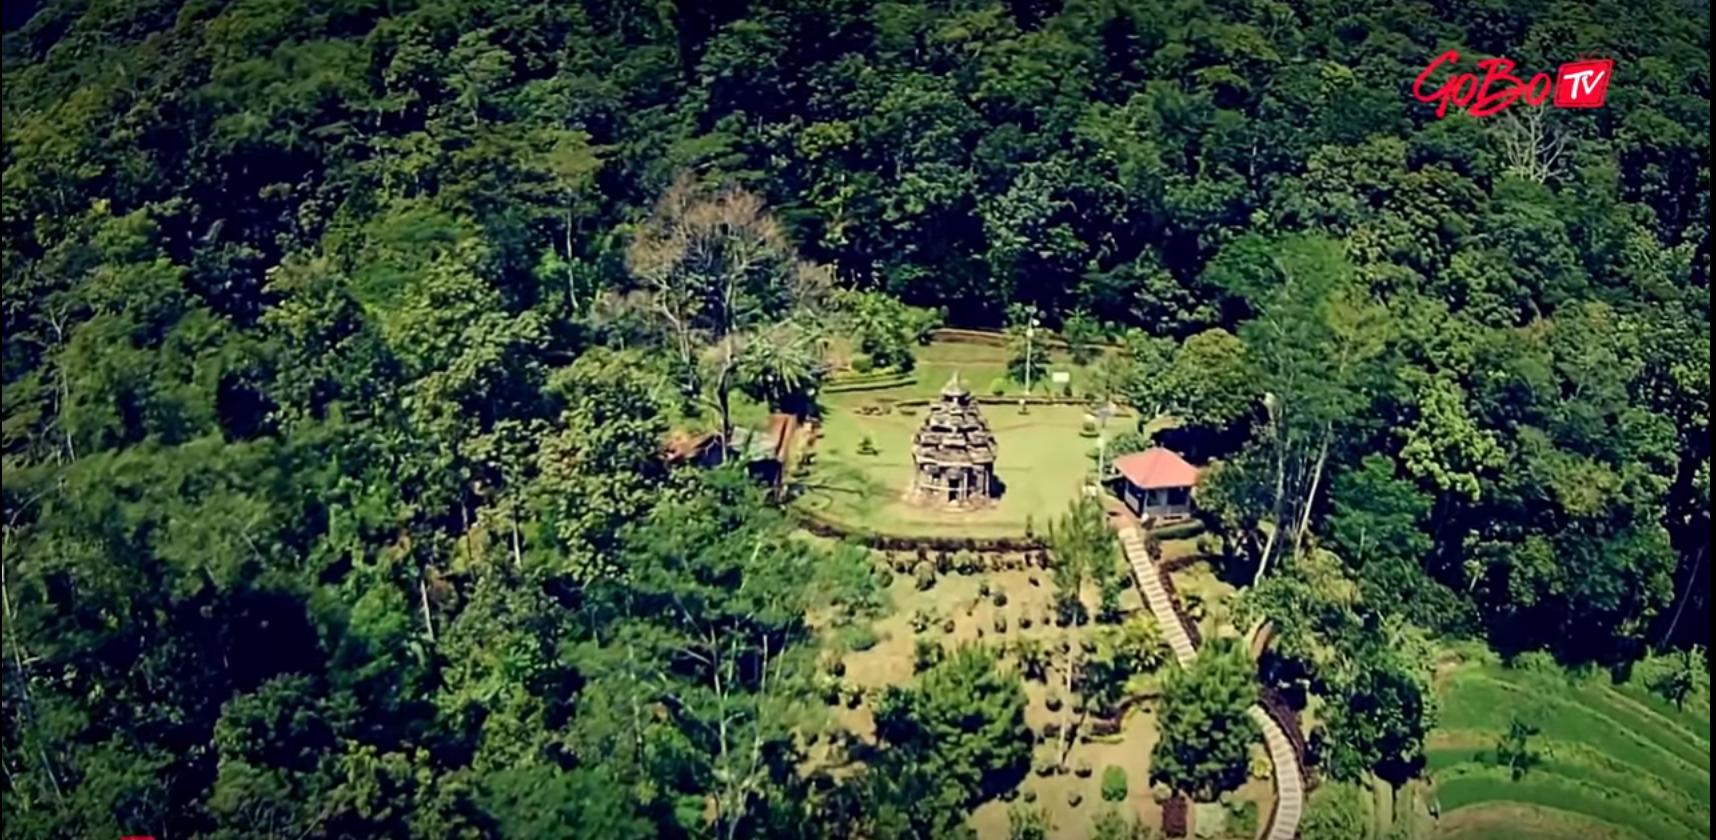 Borobudur Movie Episode 7 Candi Selogriyo Ubudnya Pulau Jawa Selogrio